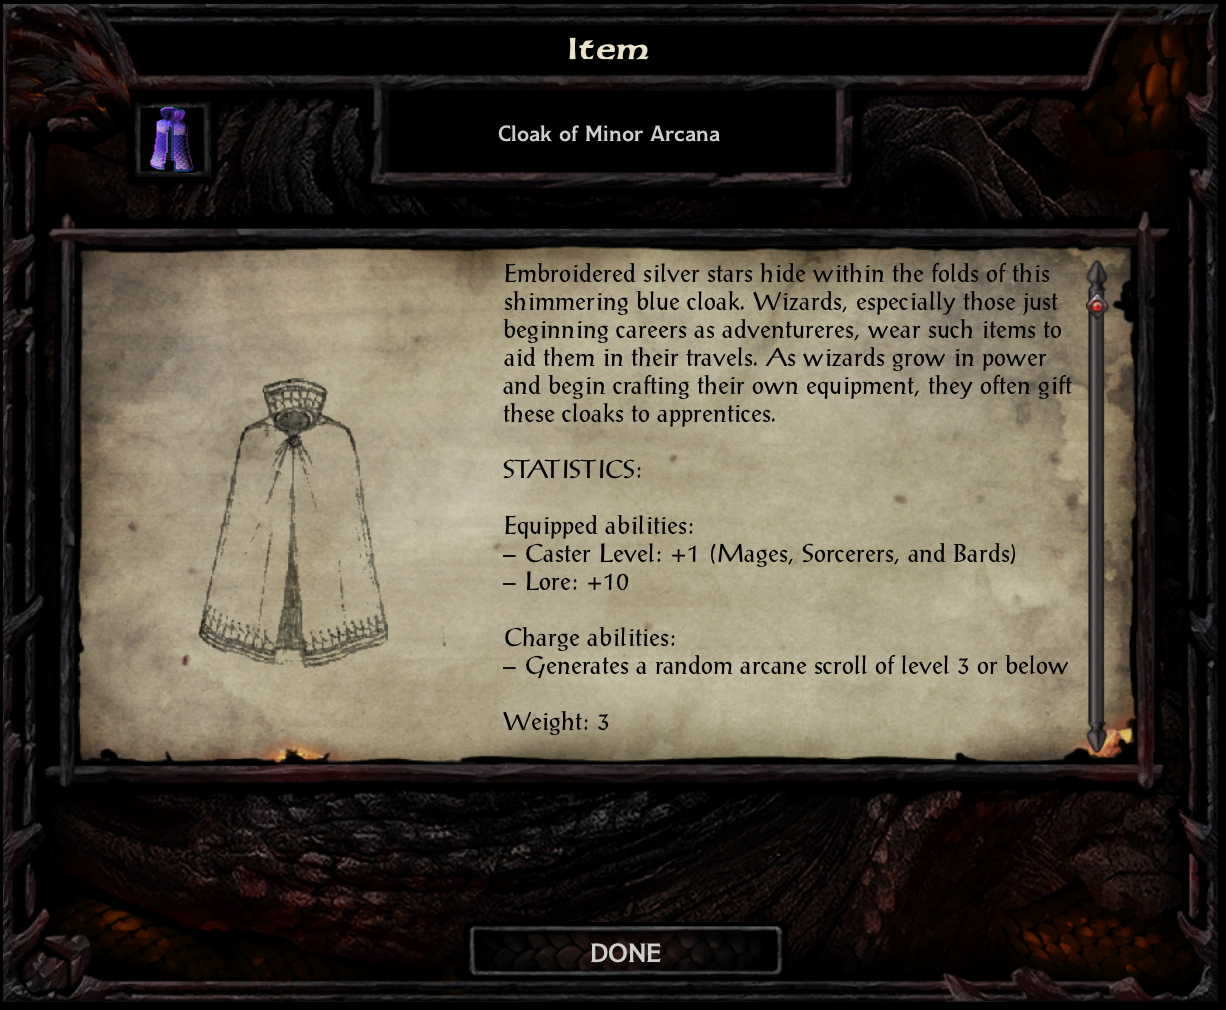 Cloak of Minor Arcana